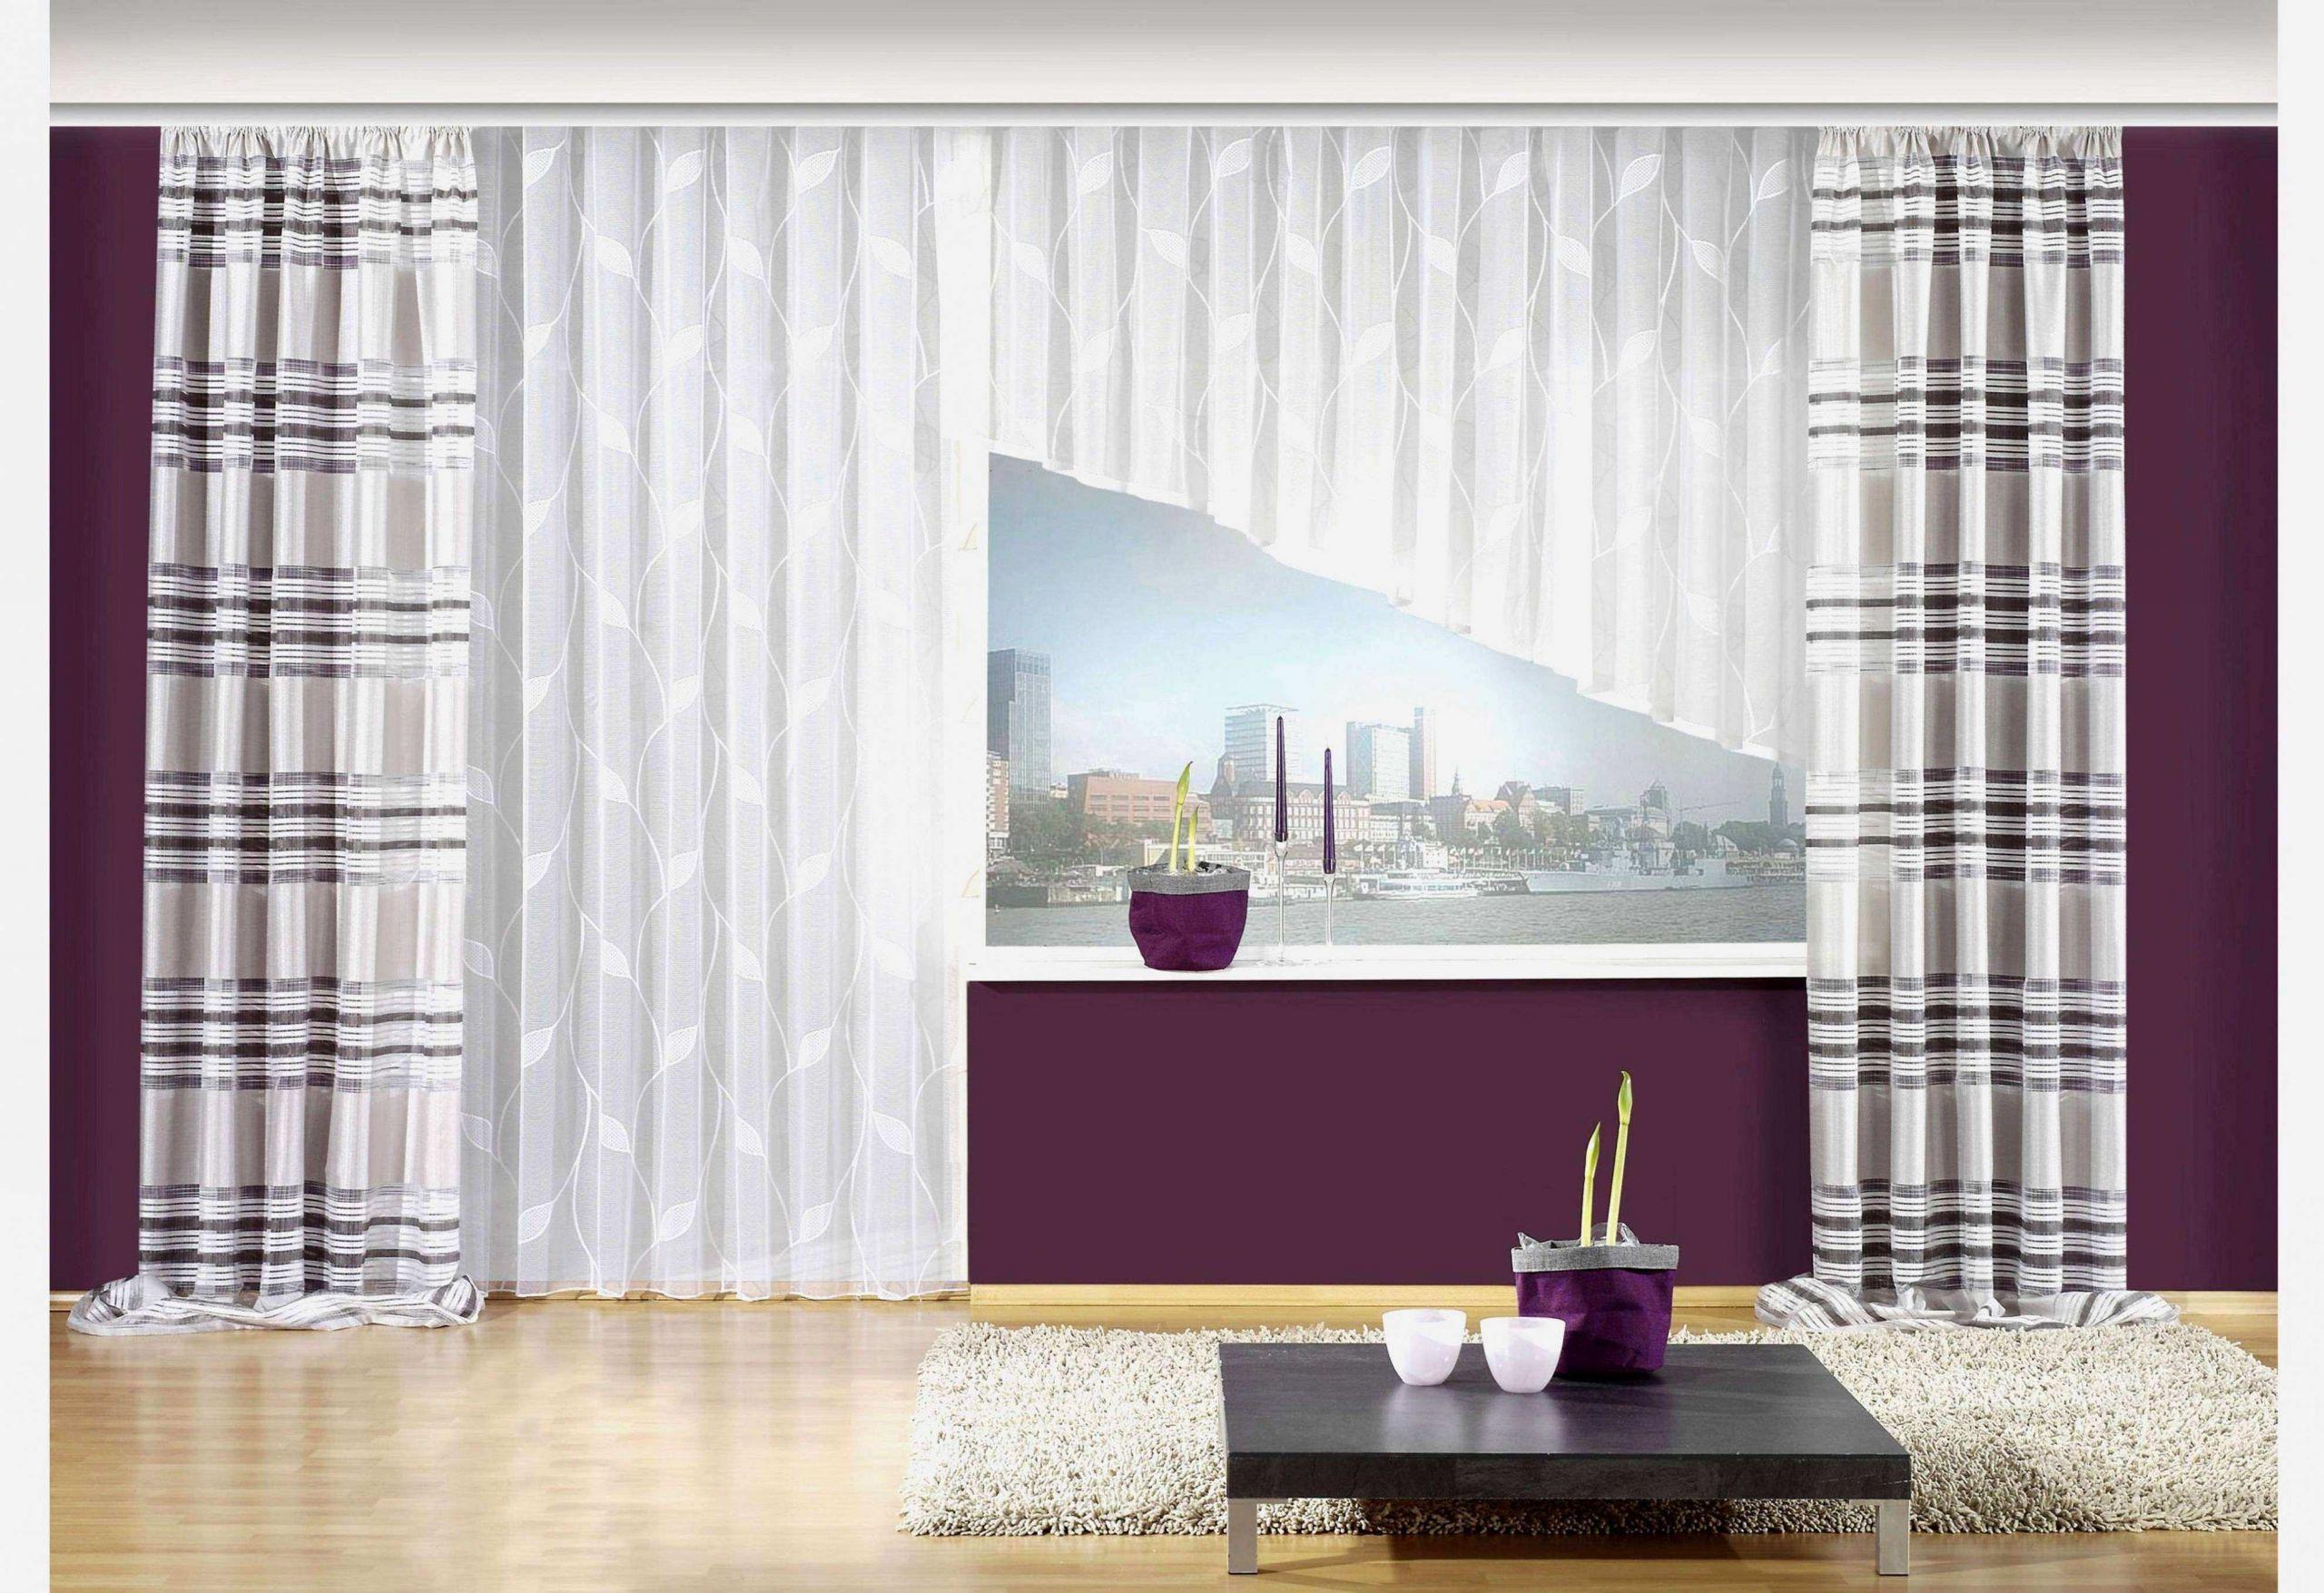 schone deko ideen neu unique schone wohnzimmer bilder of schone deko ideen